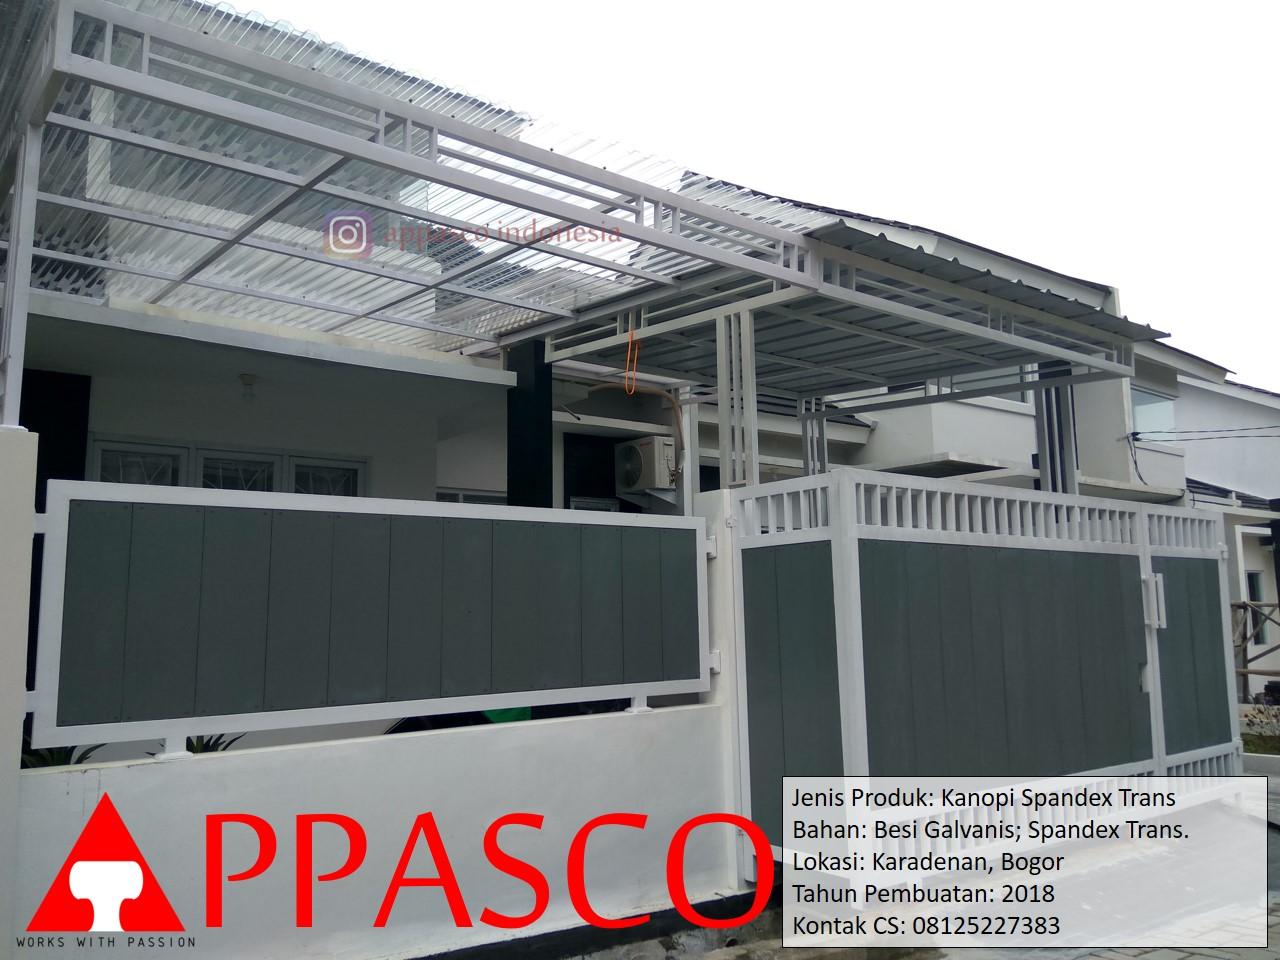 Kanopi Spandek Bening Transparan dengan Besi Galvanis di Karadenan Bogor